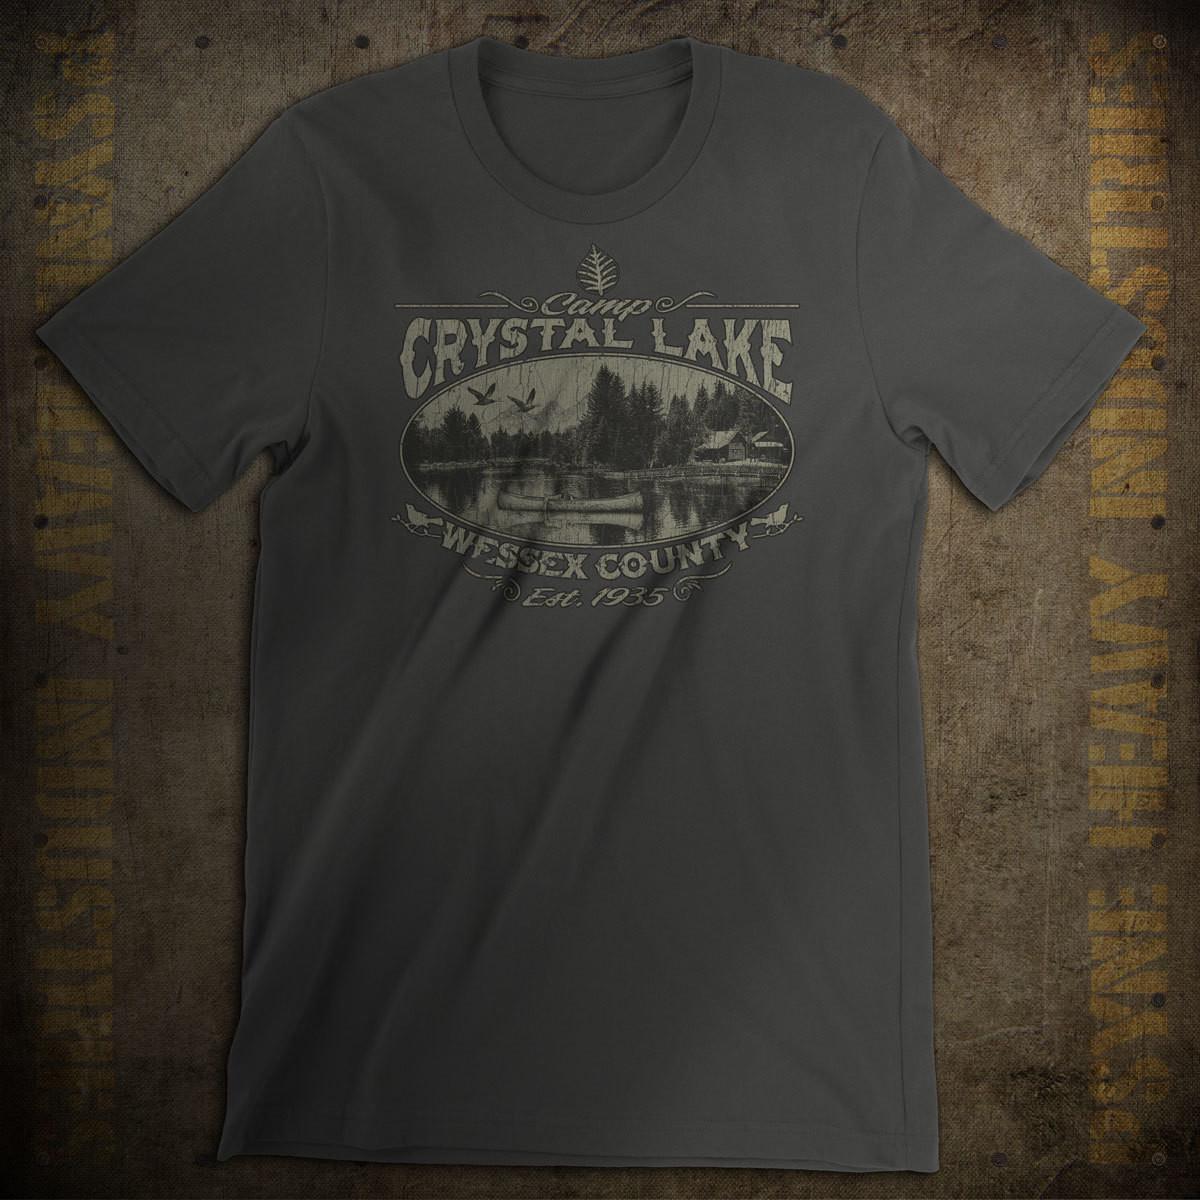 Camp Crystal Lake Vintage T-Shirt